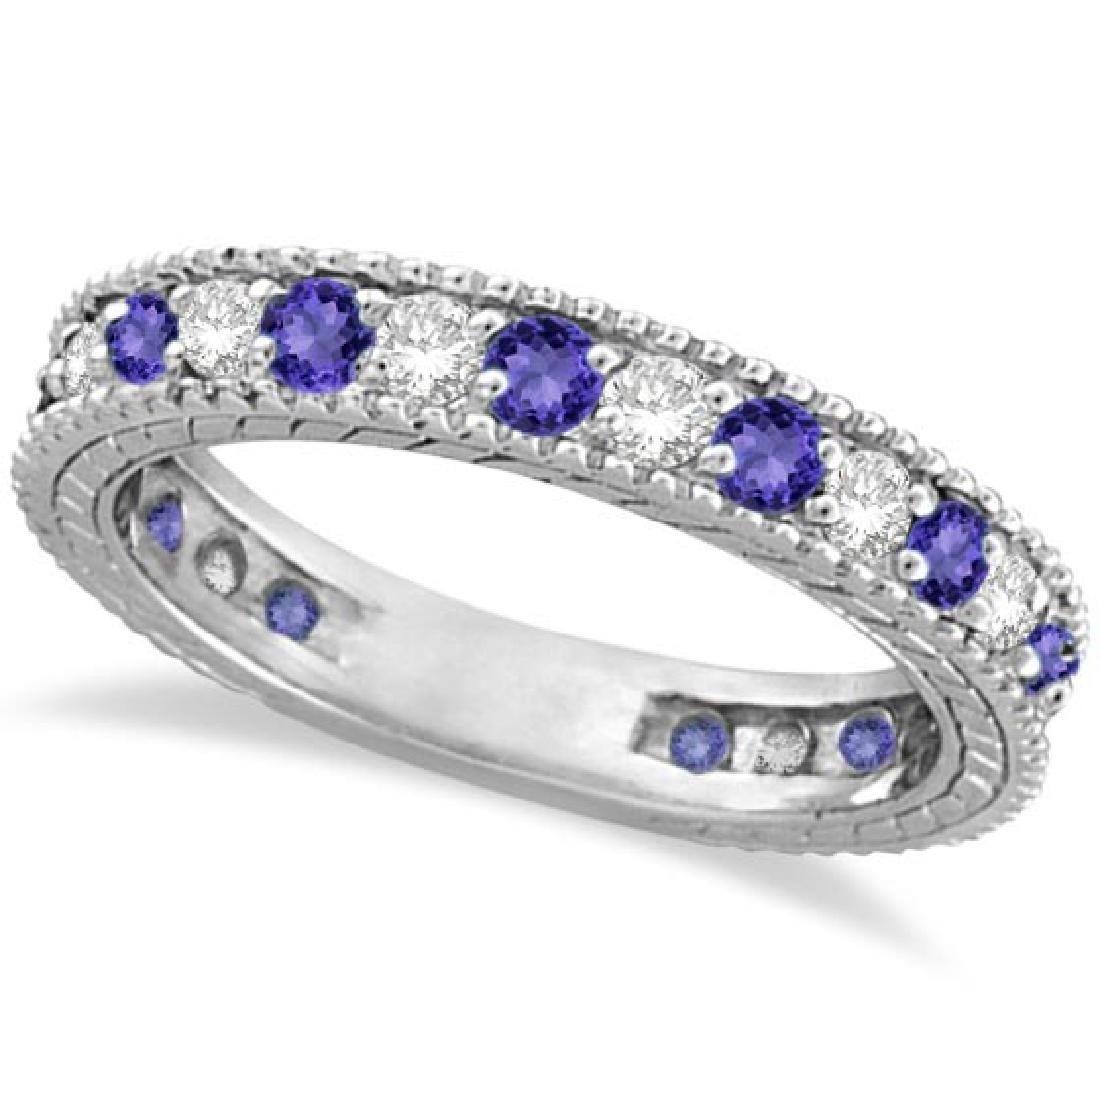 Diamond and Tanzanite Eternity Ring Band 14k White Gold